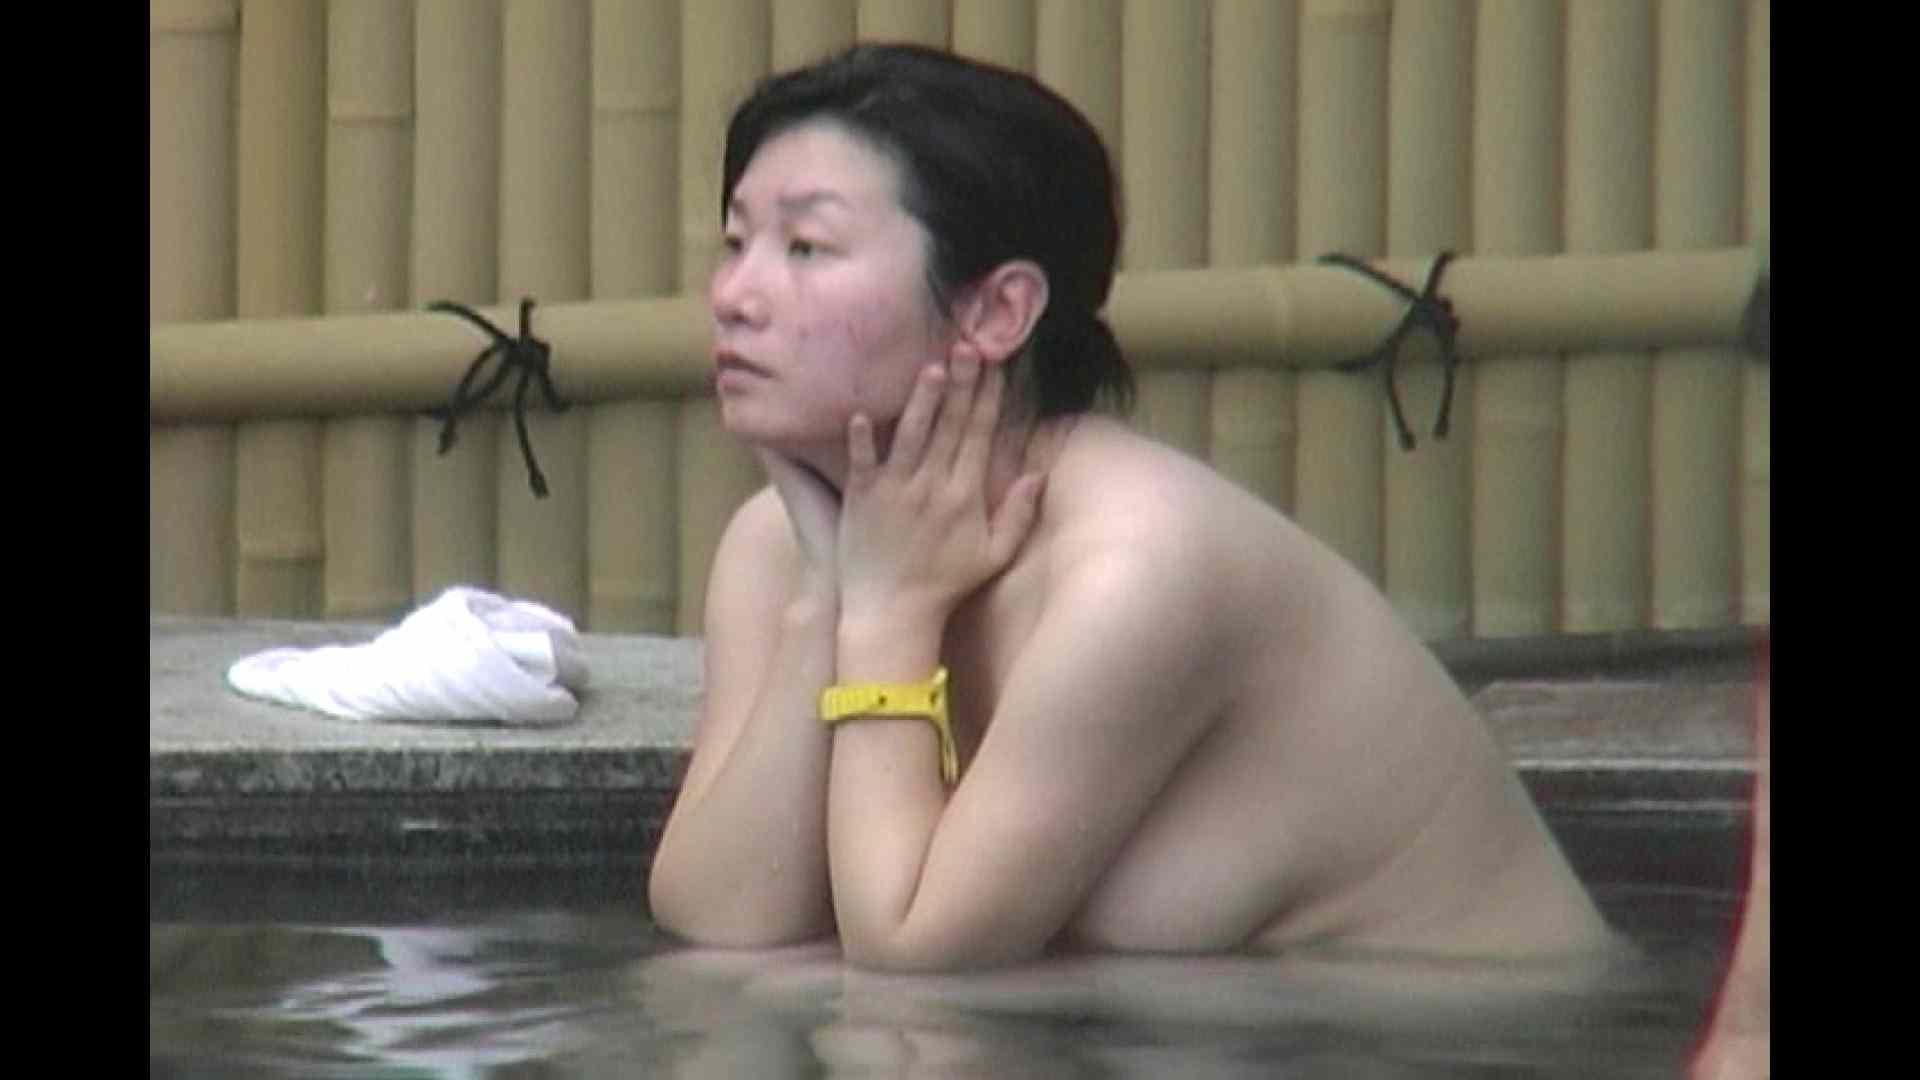 Aquaな露天風呂Vol.545 盗撮 | OLセックス  56画像 25